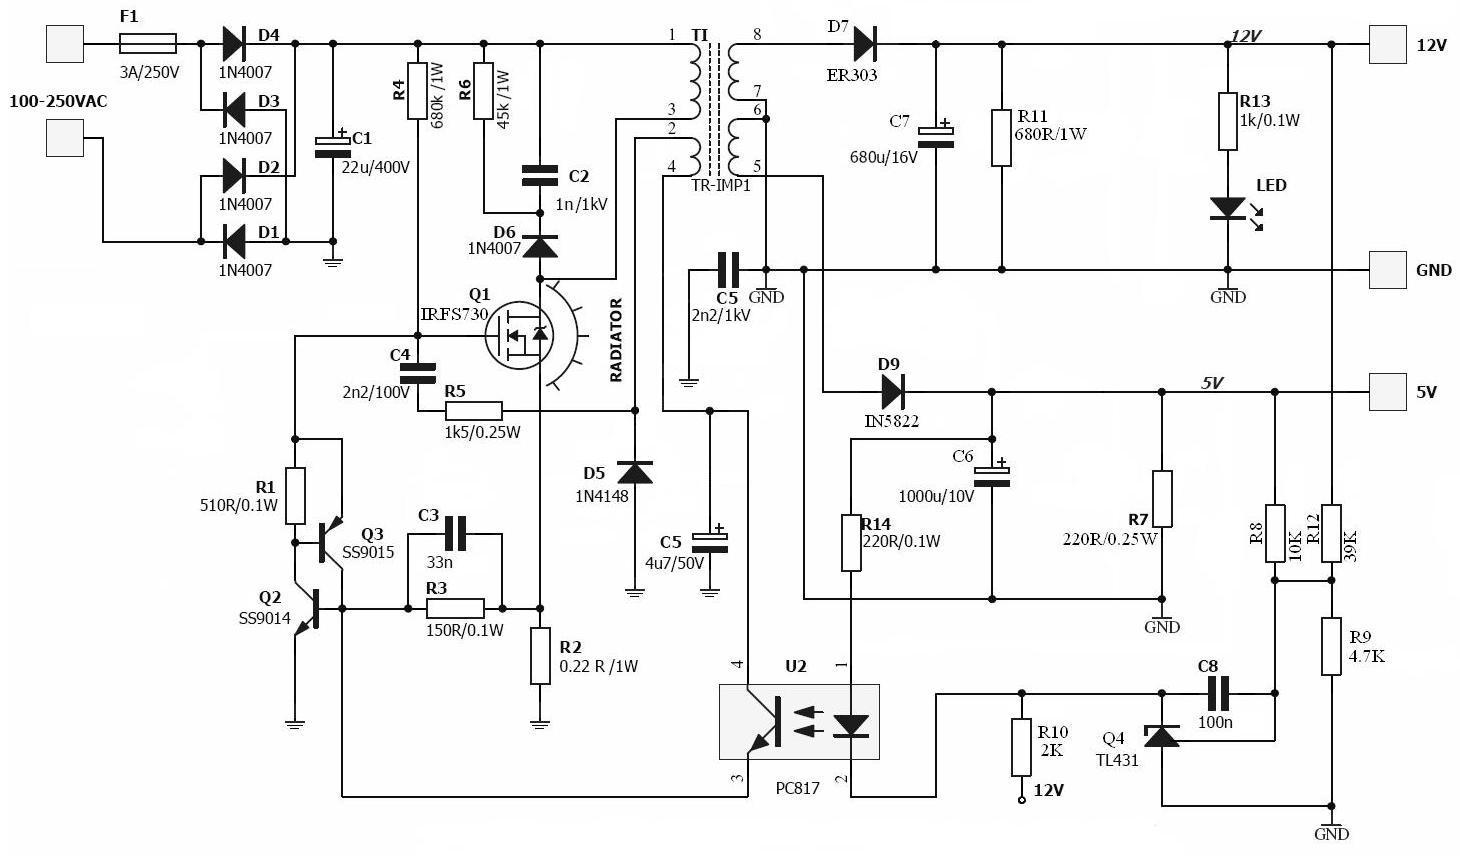 Zasilacz model: YH-3018-5 adapter SATA/ATA poszedł